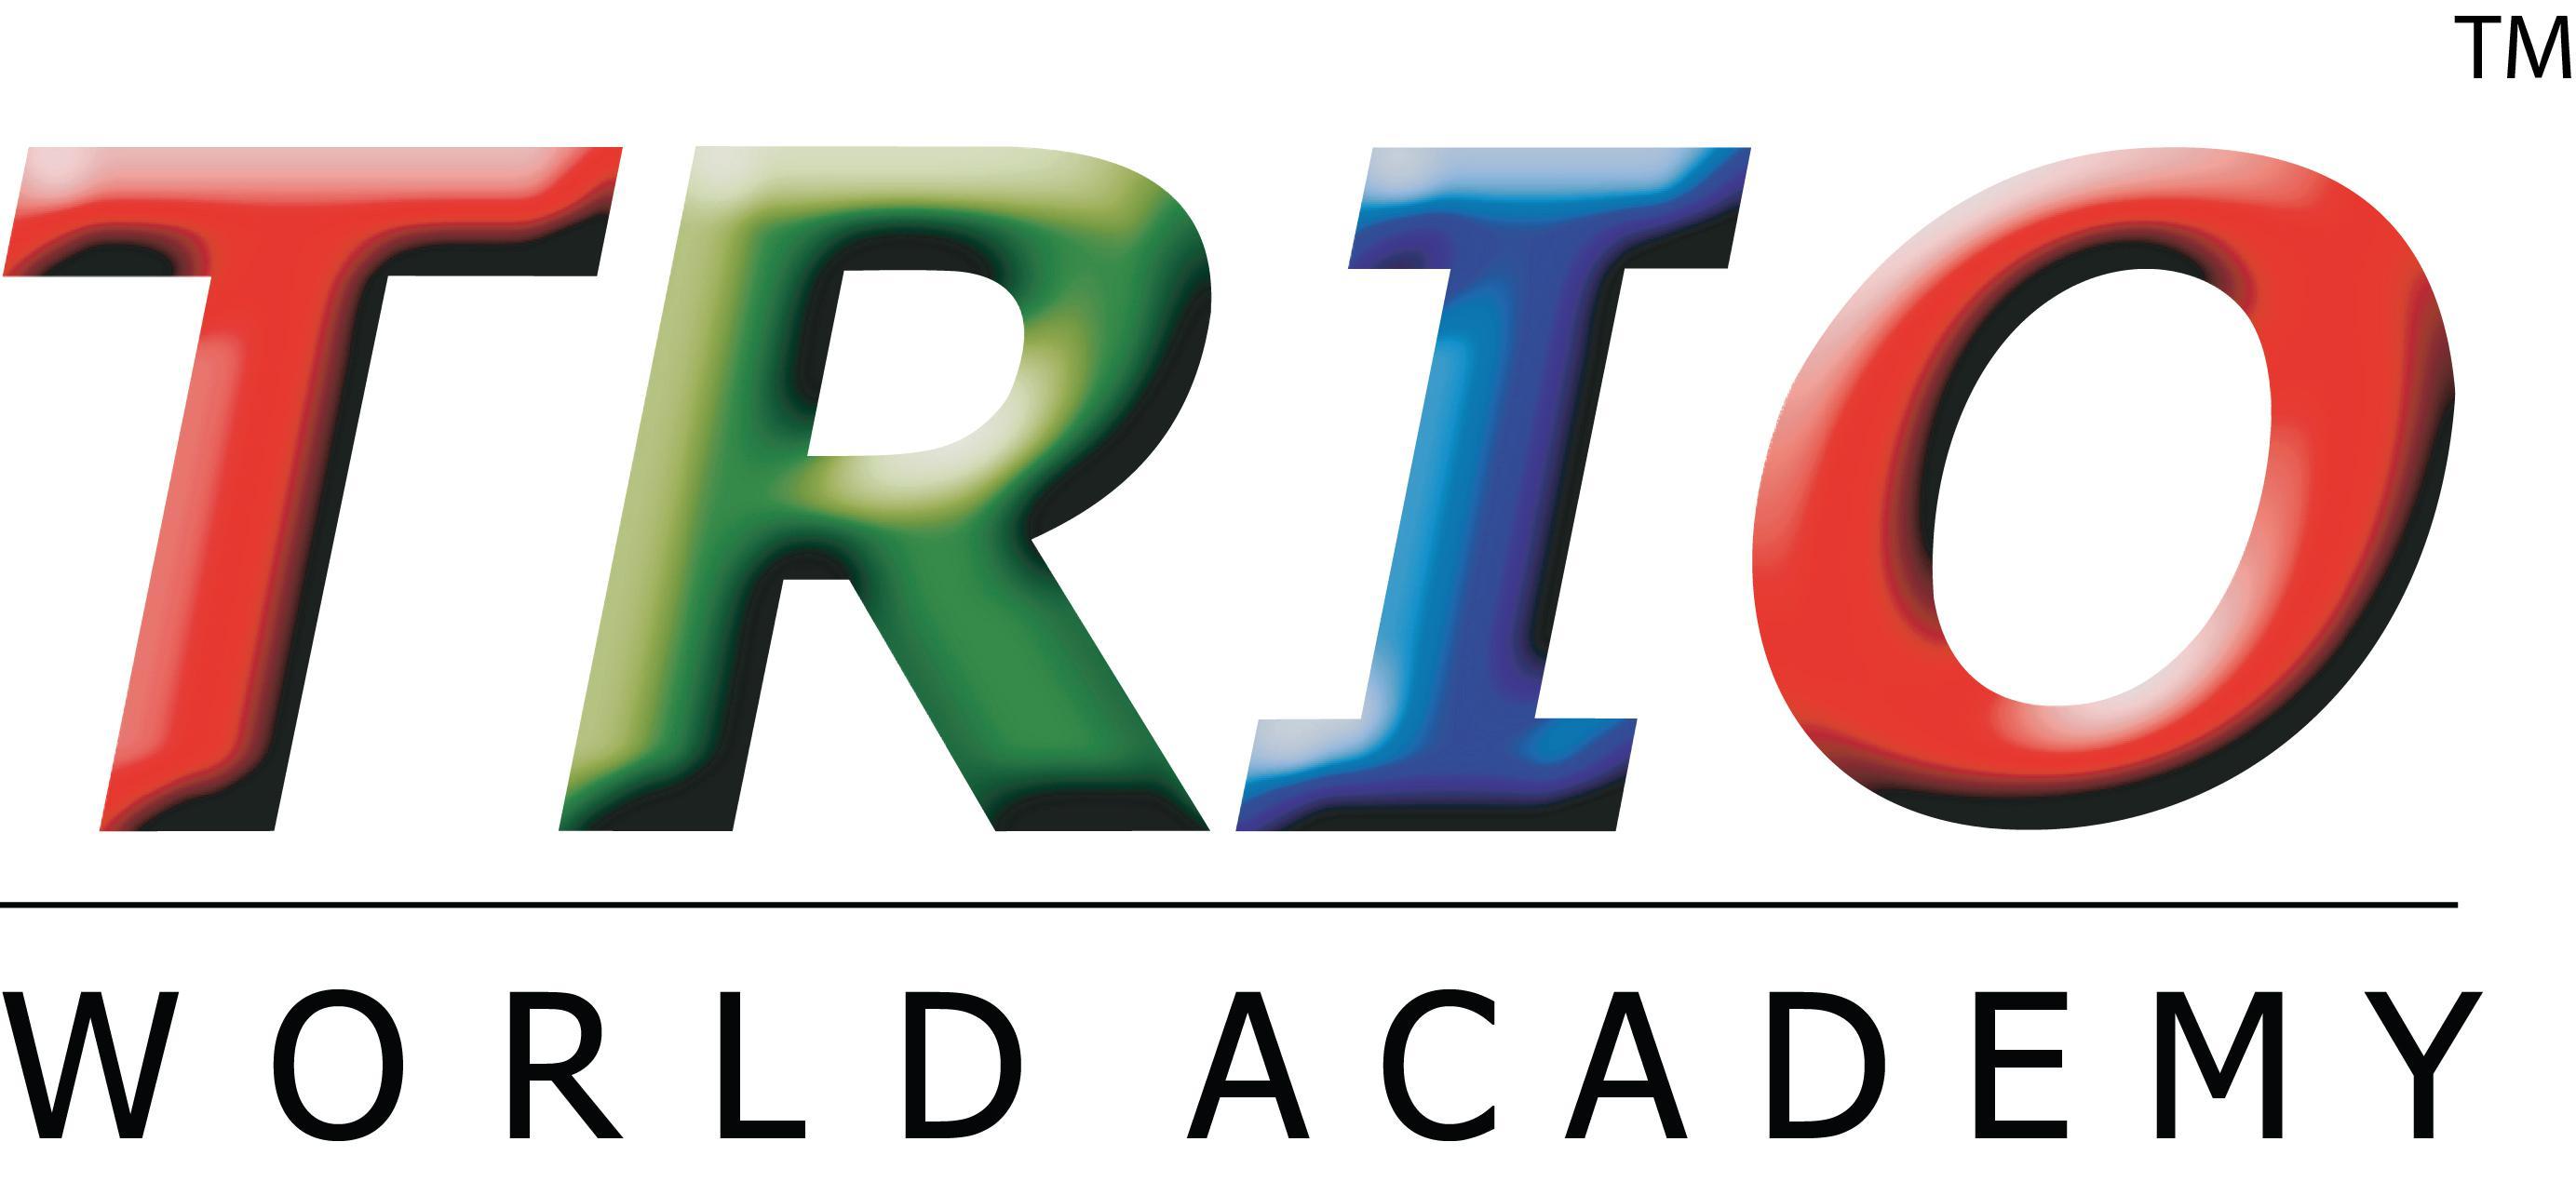 Trio World Academy, Trio World Academy